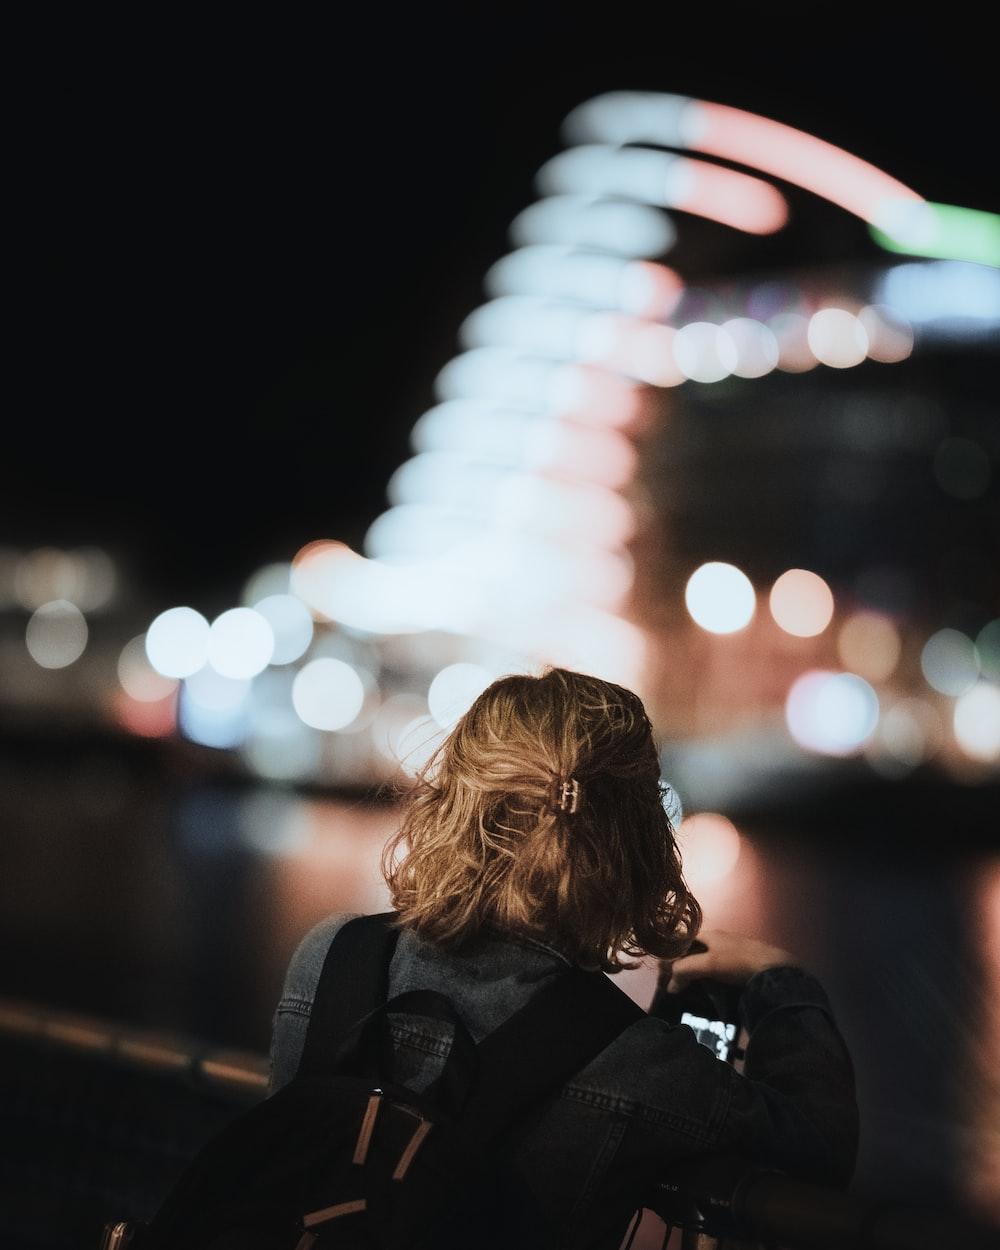 woman in black jacket standing on sidewalk during night time